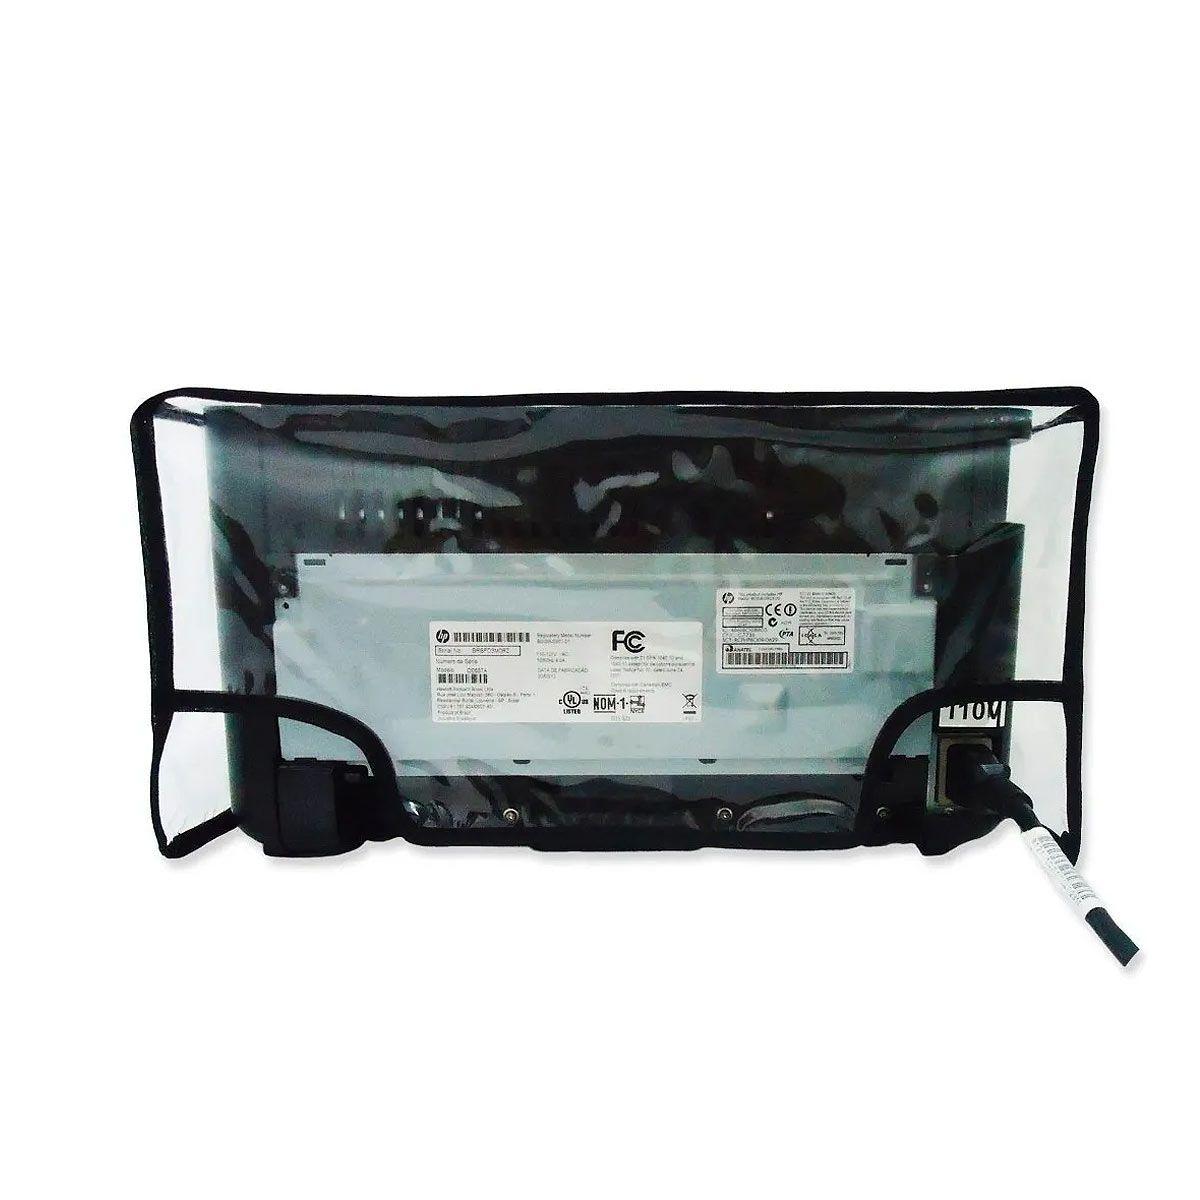 Capa Impressora Hp Laserjet P1102 Em Pvc Cristal